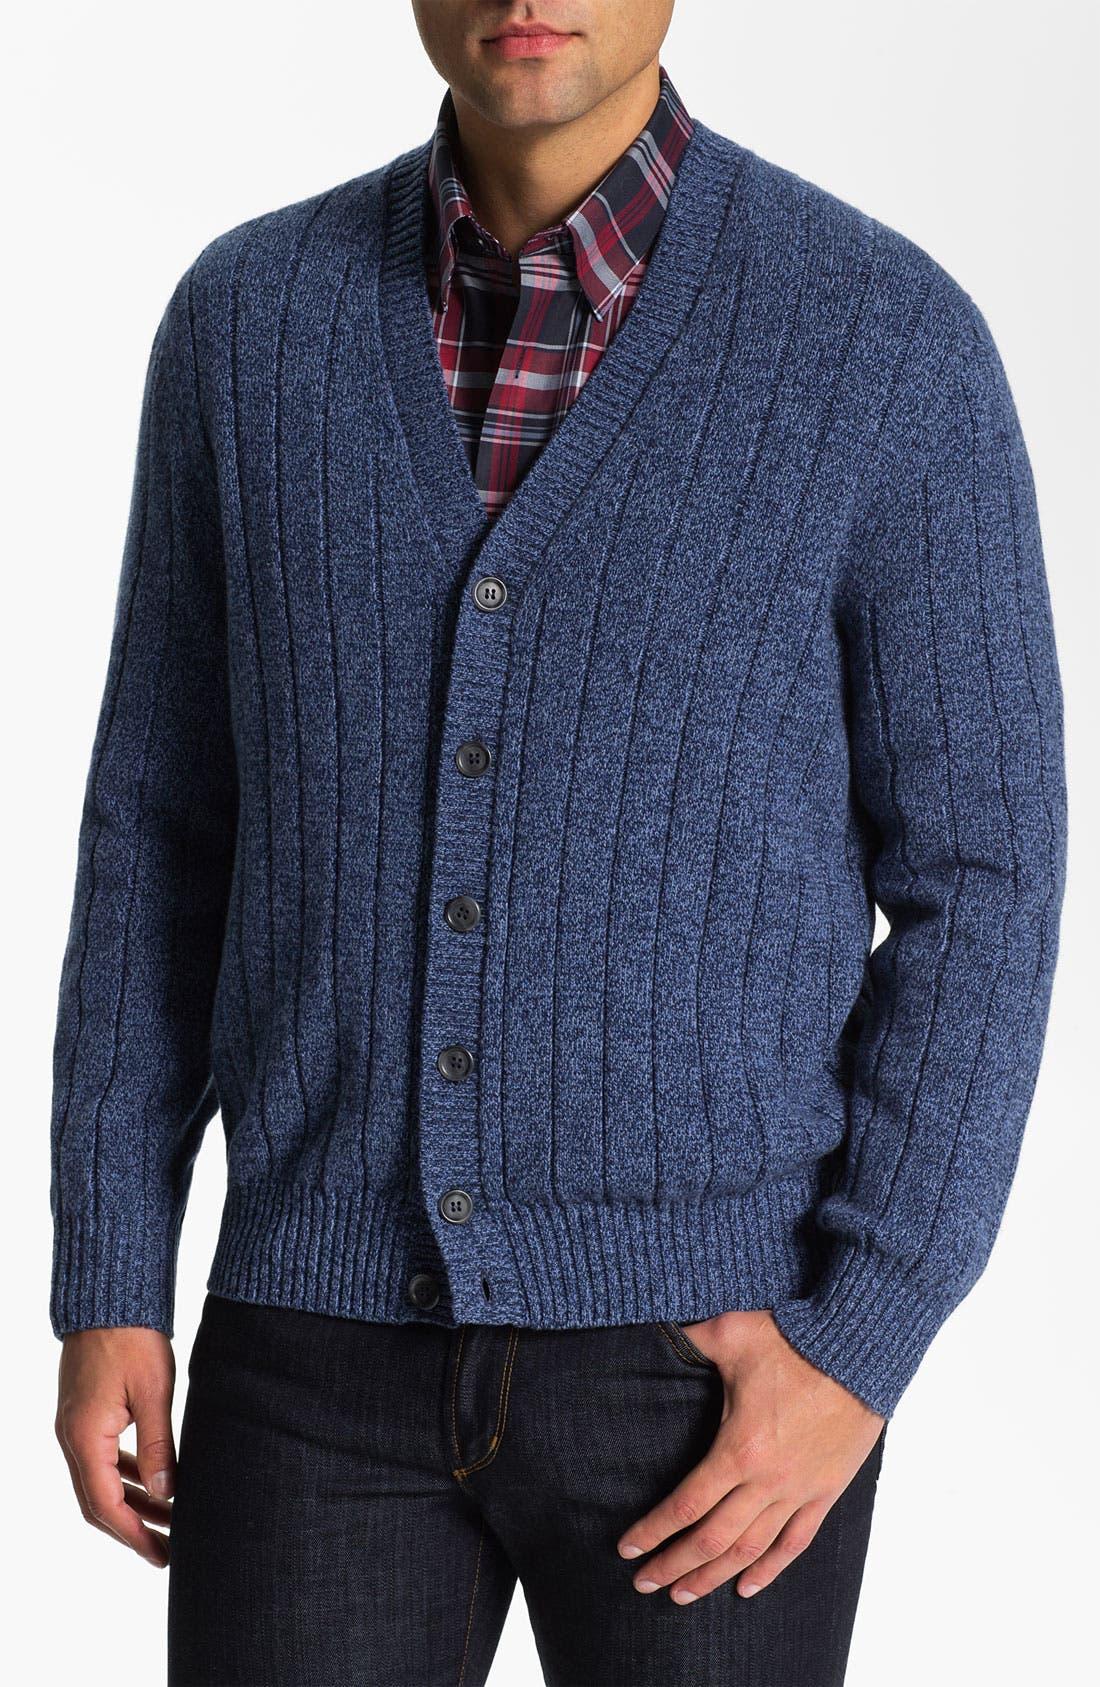 Main Image - Lora Gi Wool & Cashmere Button Cardigan